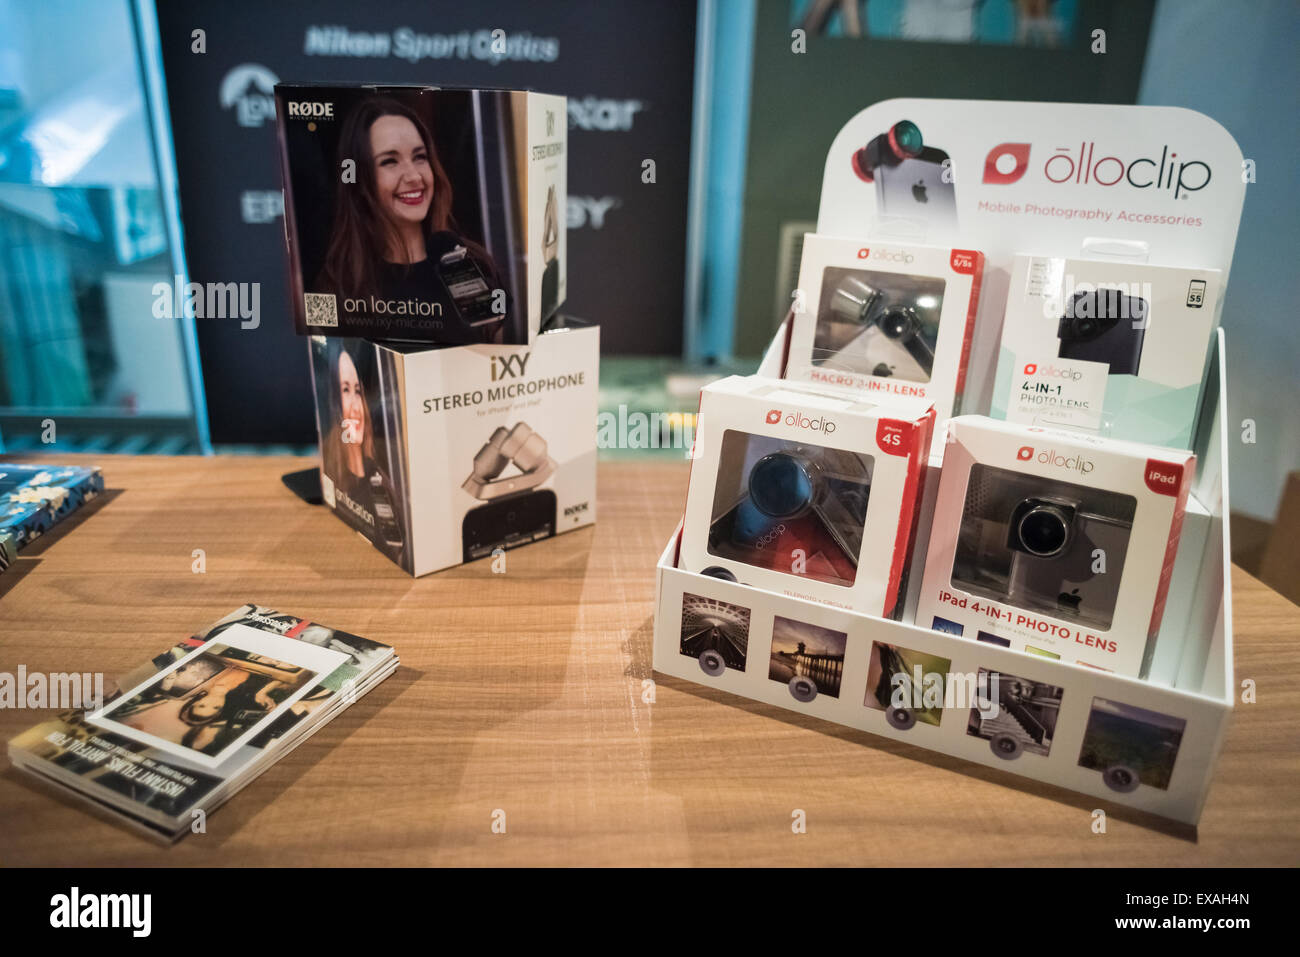 MILAN, ITALY - SEPTEMBER 27: Nikon Live in Milan, Italy on September, 27 2014. Nikon Live is the first Nikon event Stock Photo